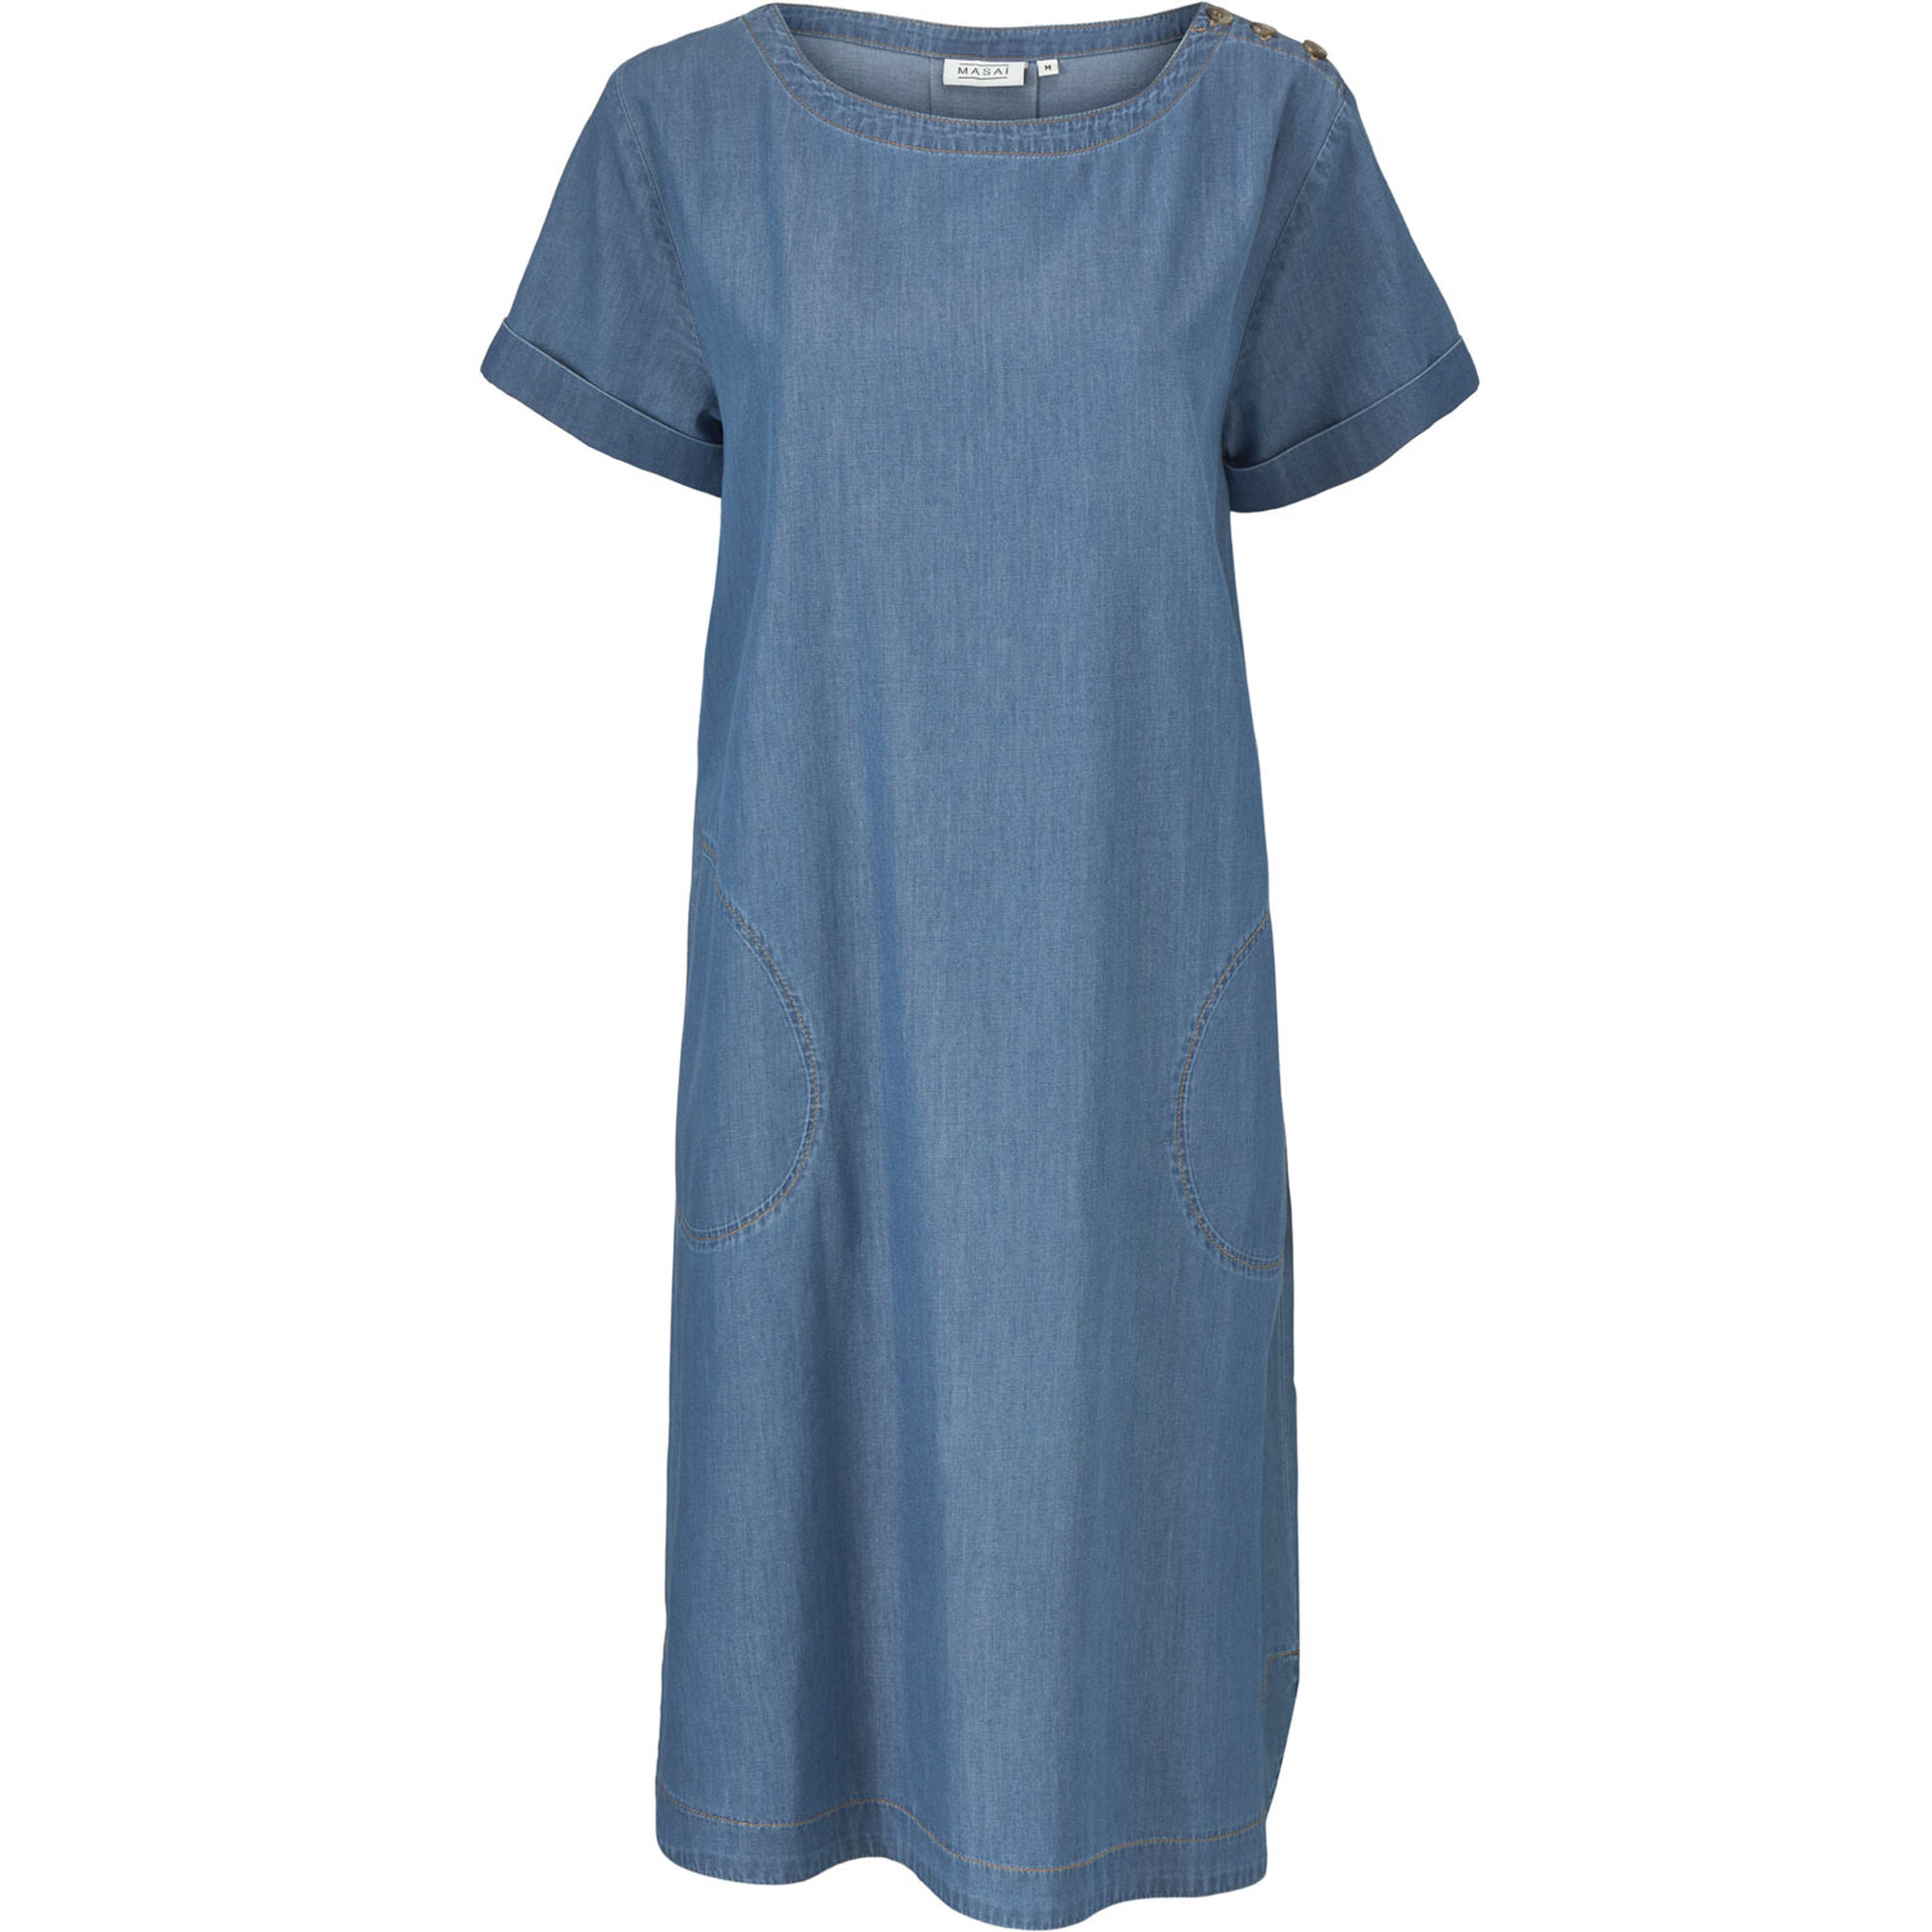 NALANI DRESS, L Basic Denim, hi-res